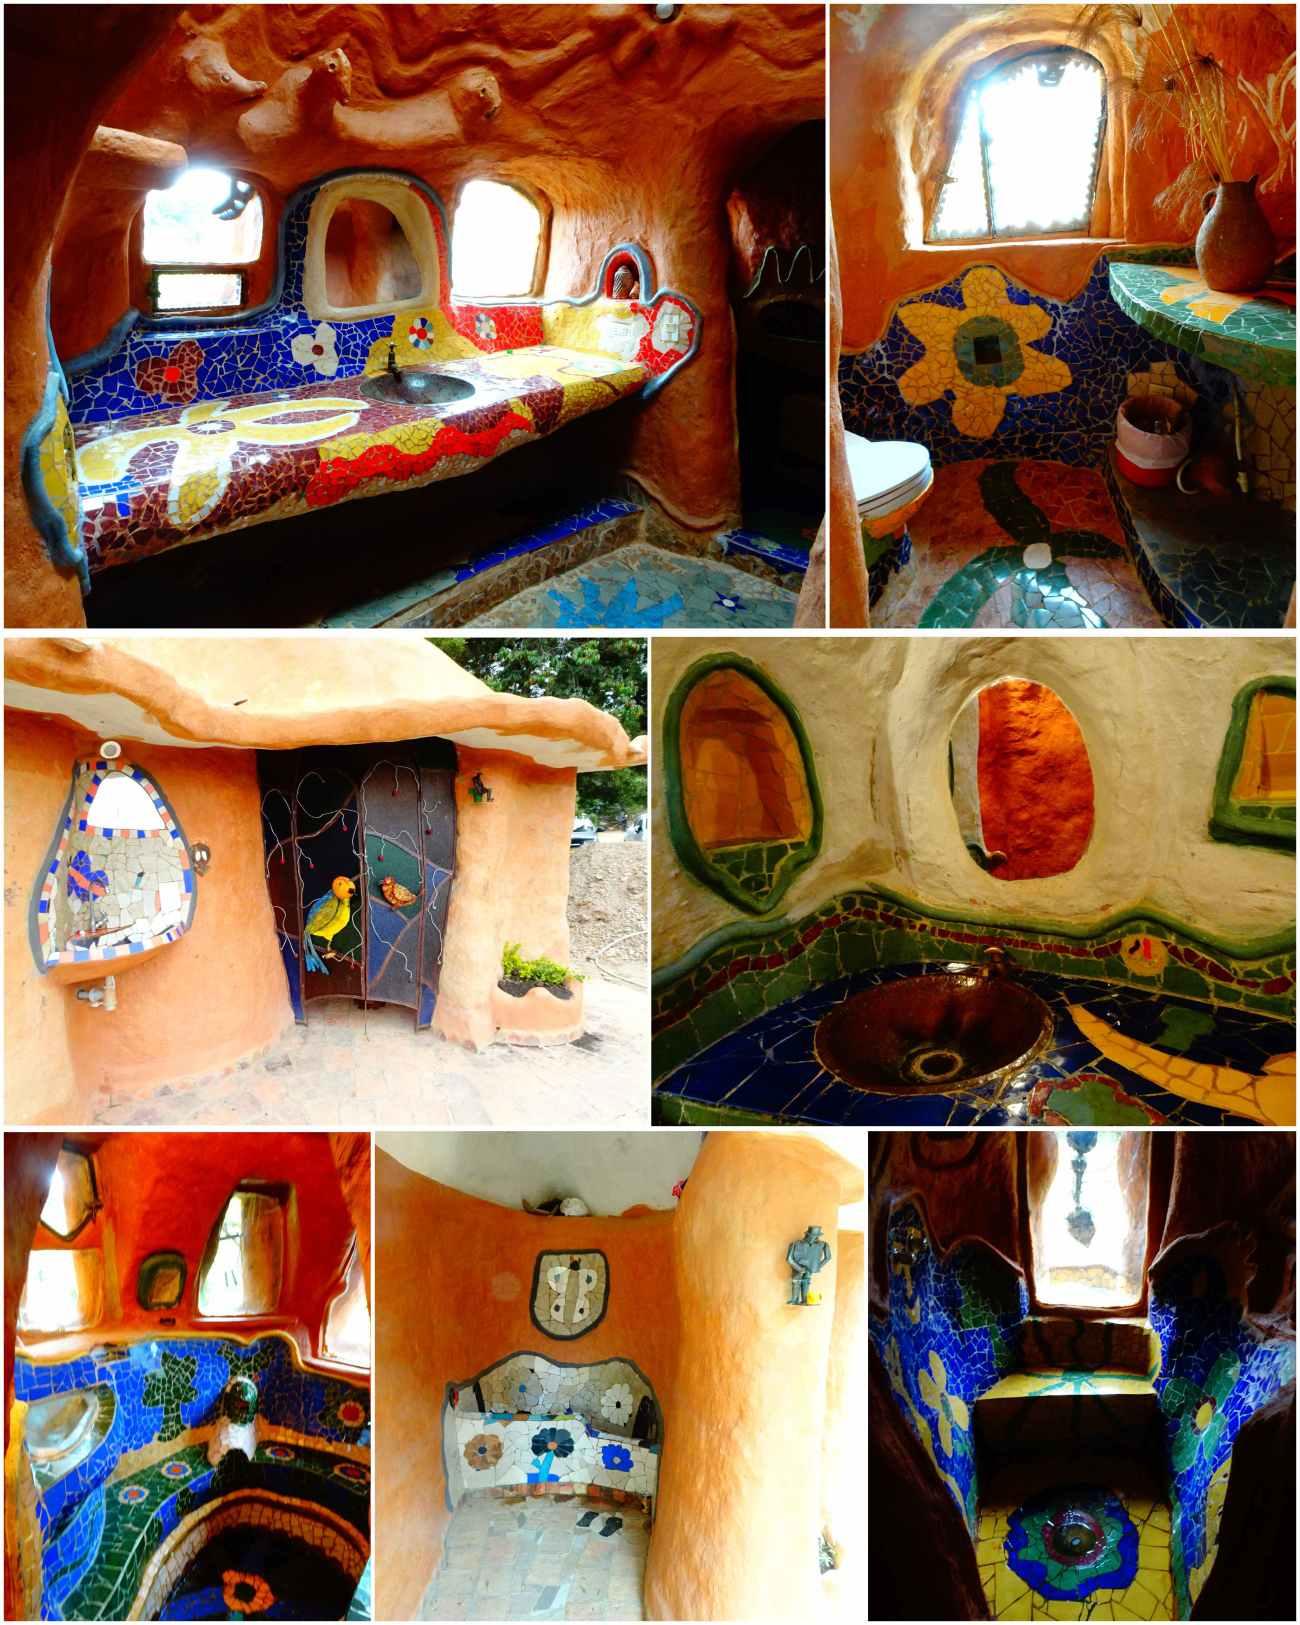 Casa terracotta sdb